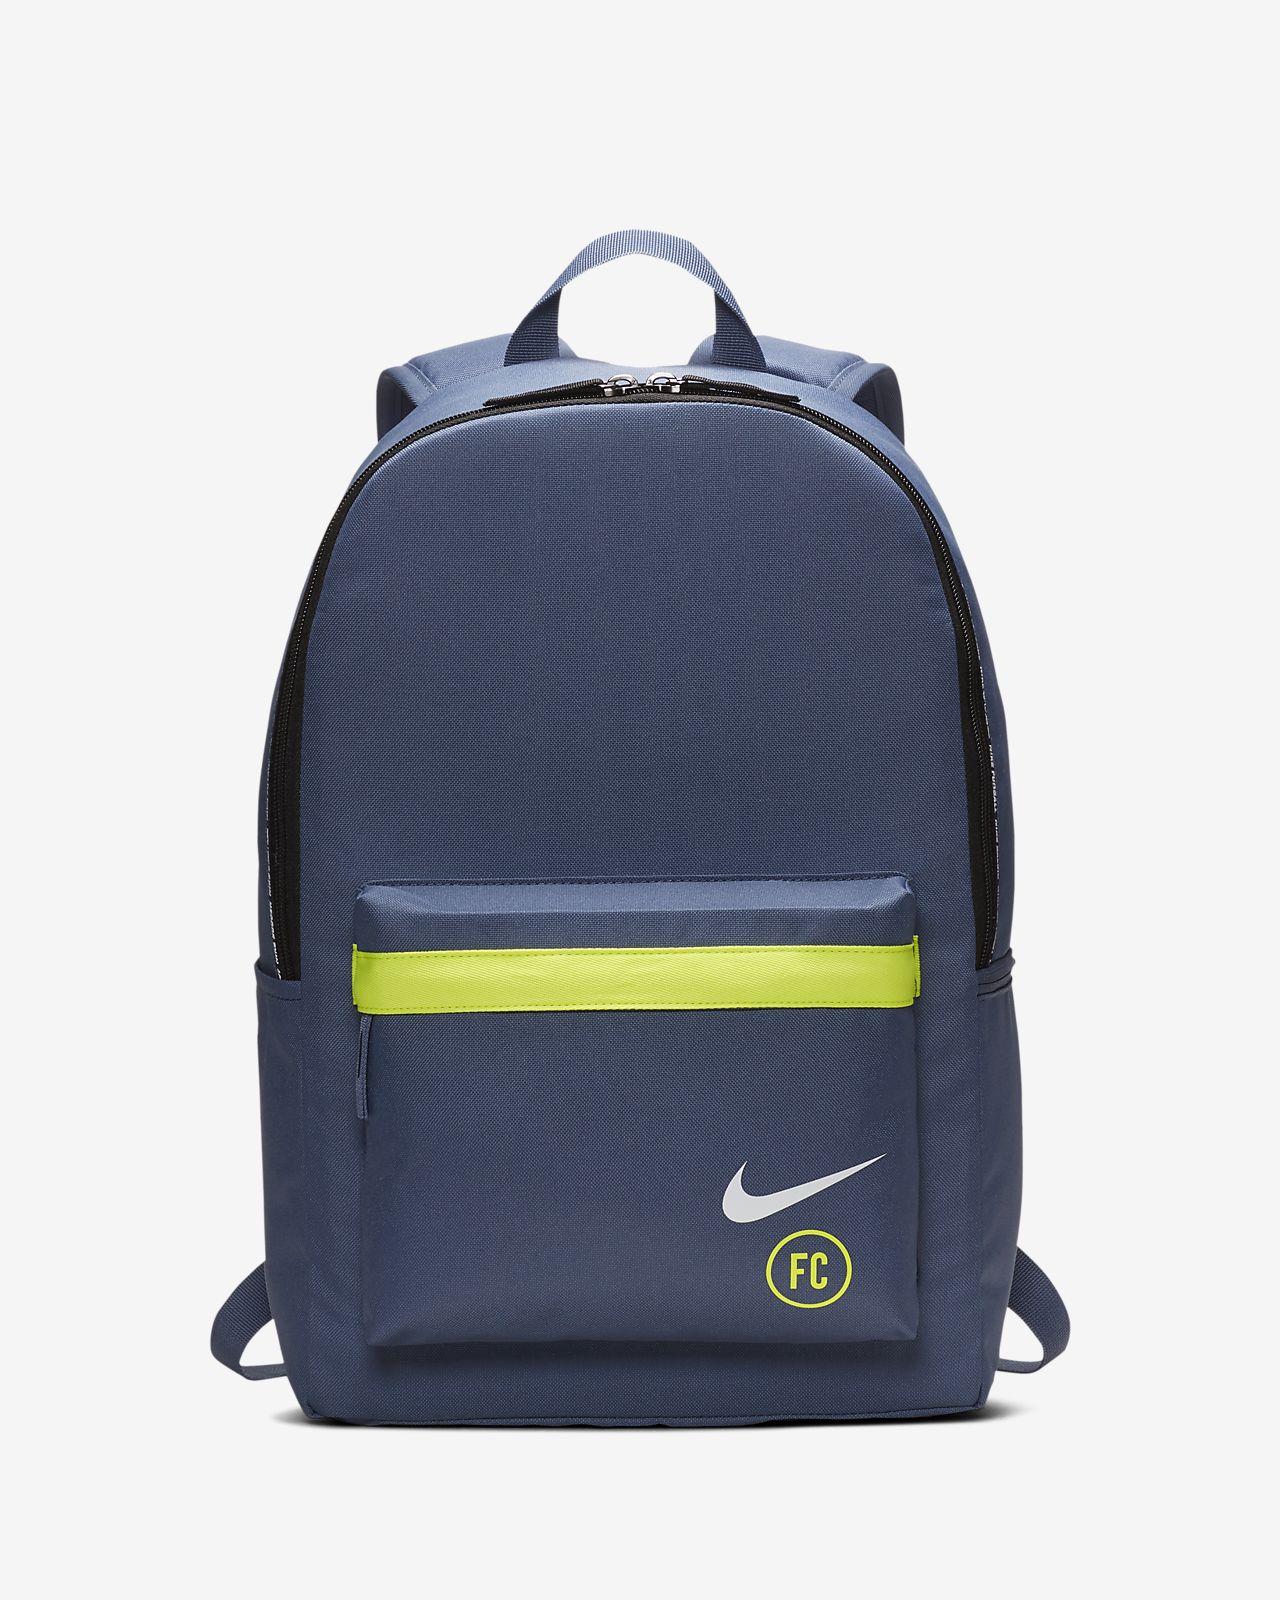 Nike F.C. Fußballrucksack